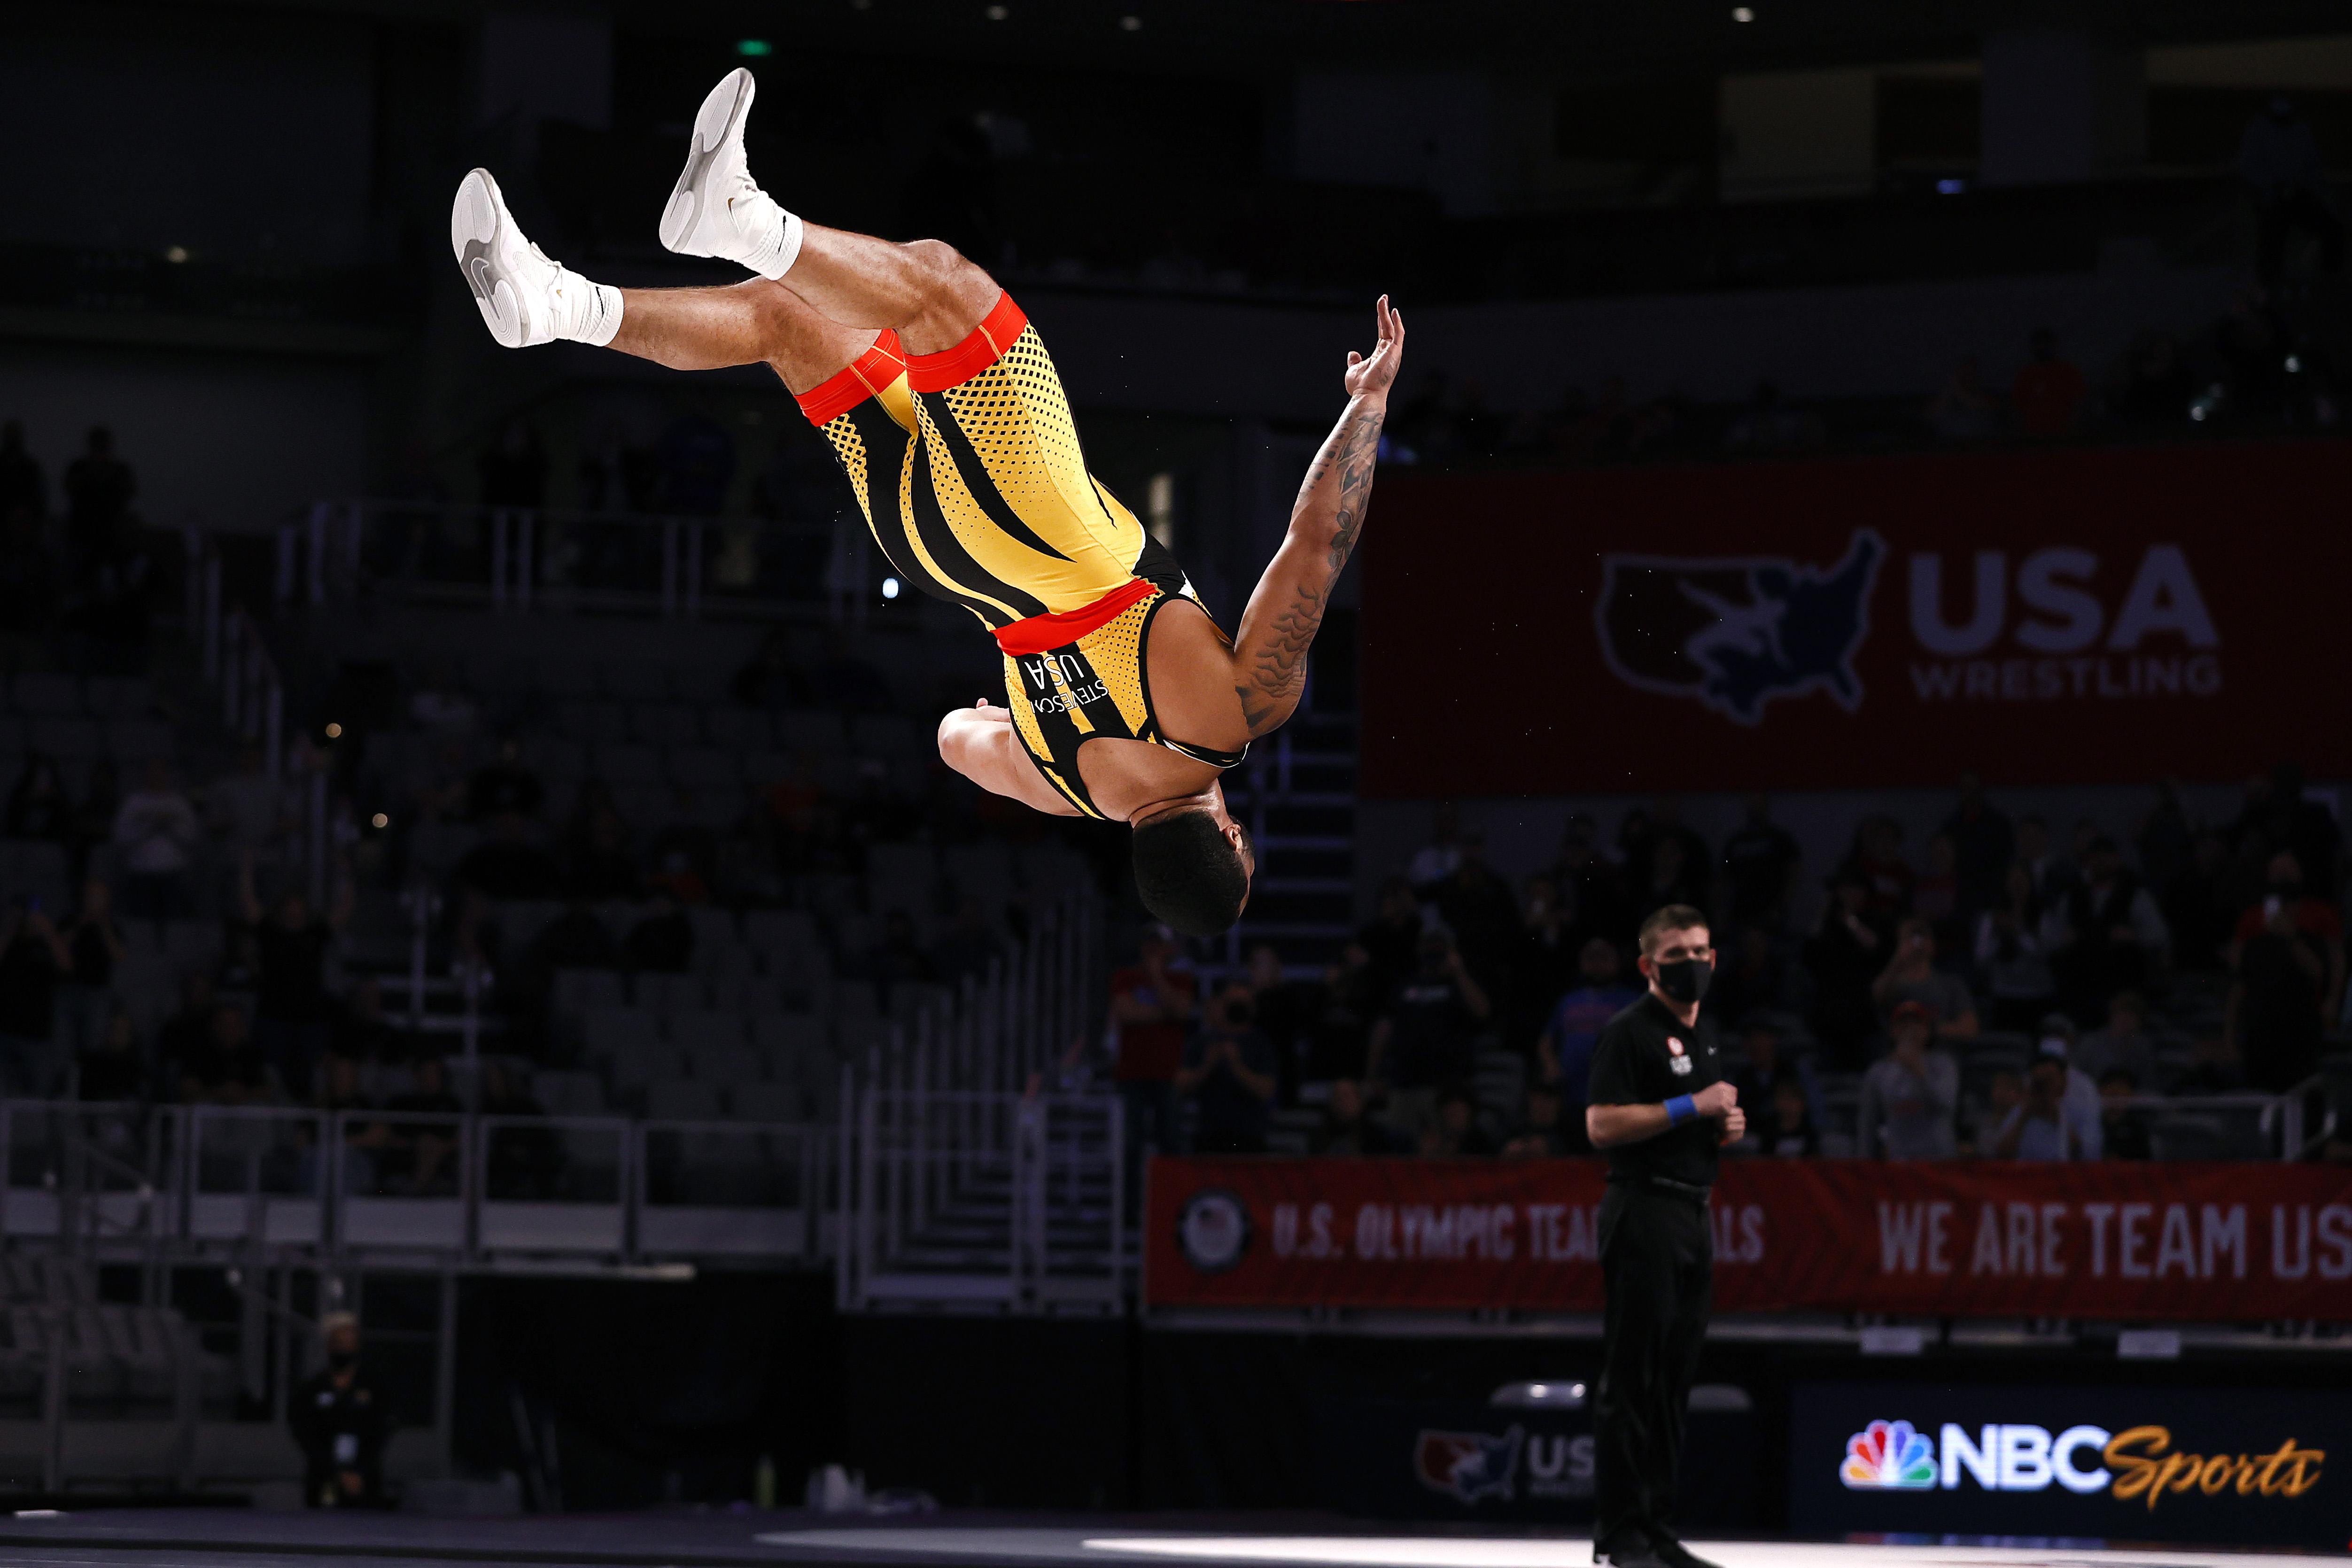 Gable Steveson - U.S. Olympic Team Trials - Wrestling